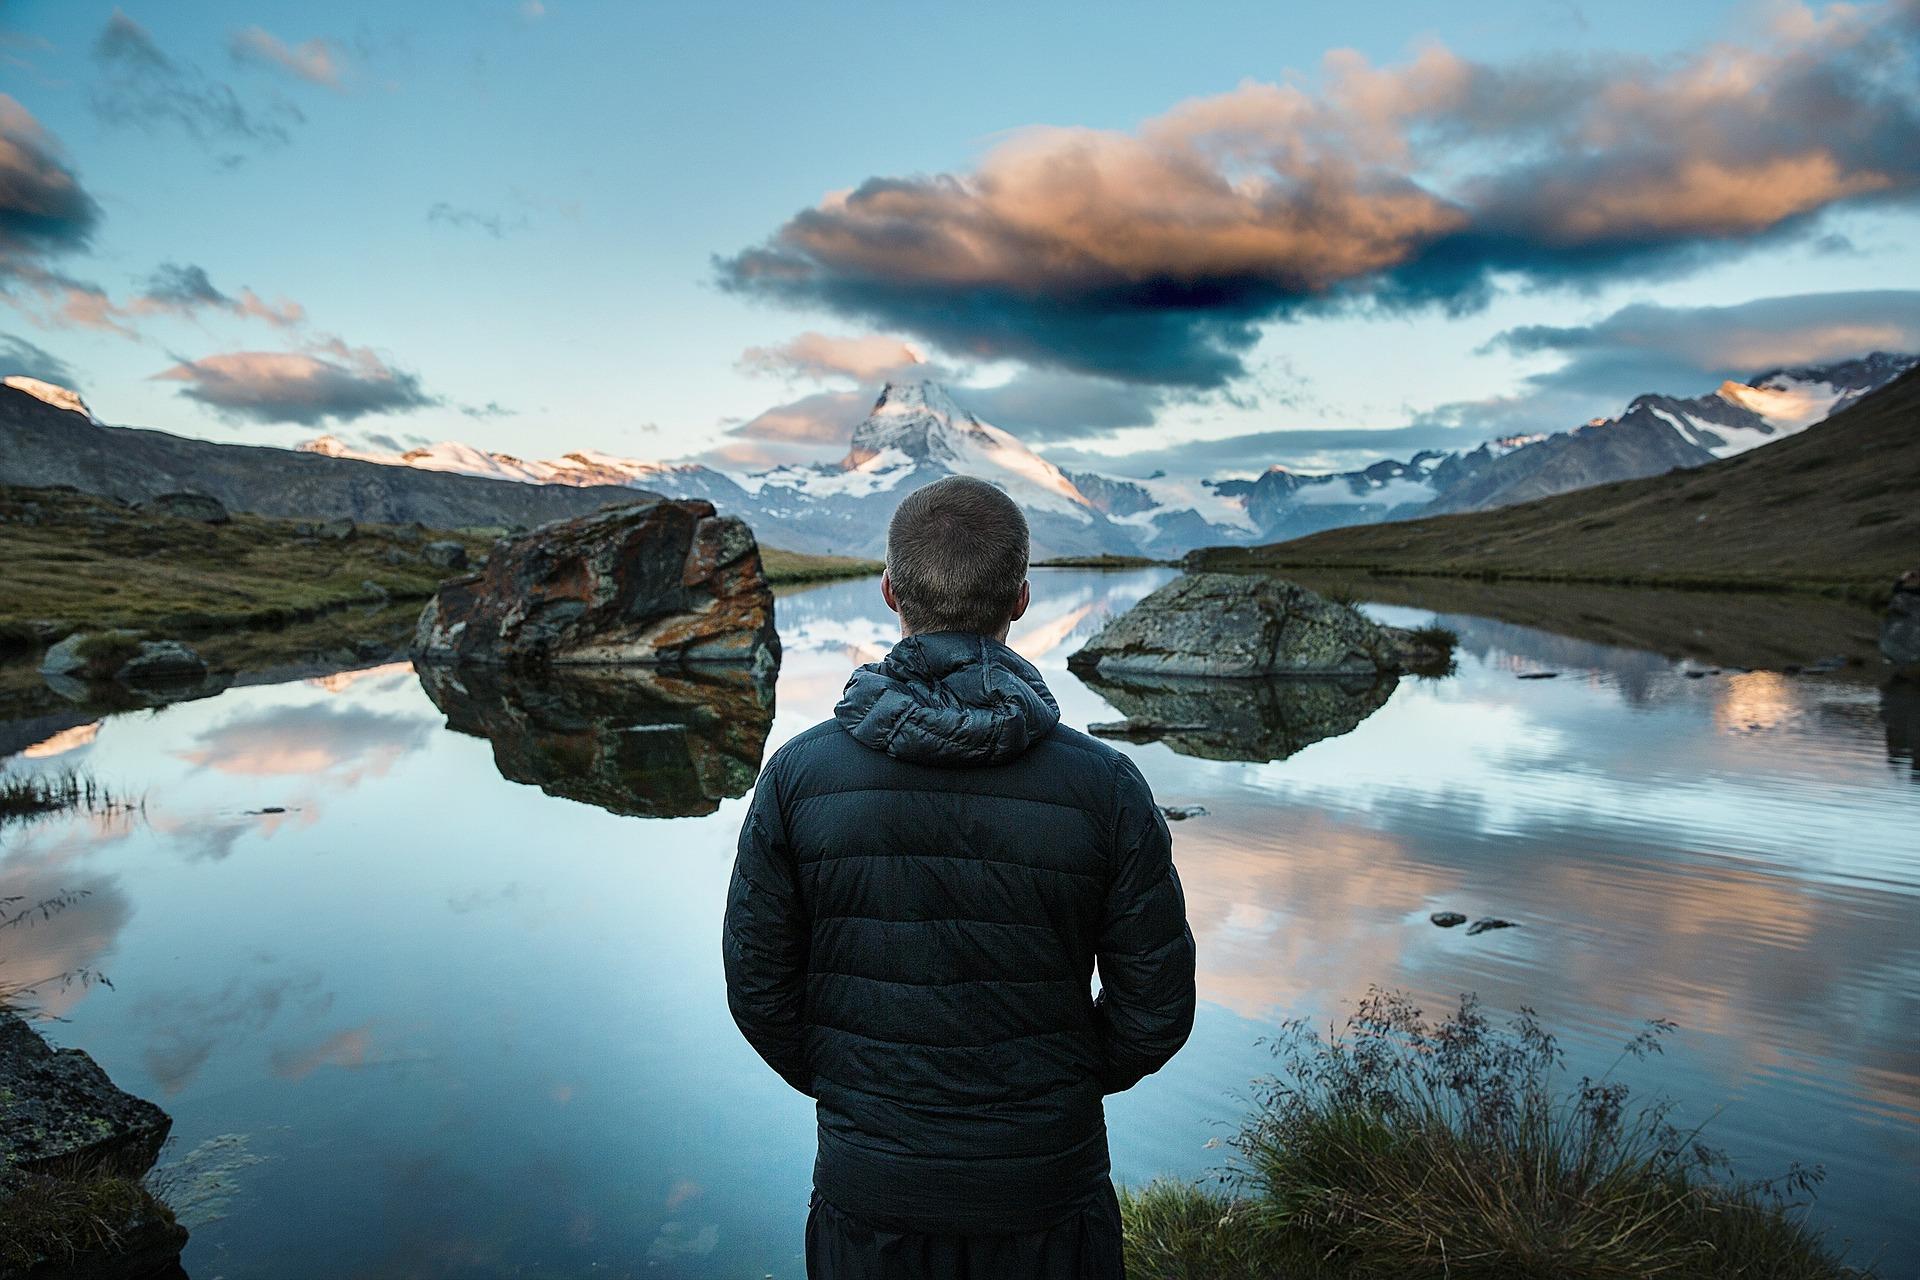 mountain-lake-931726_1920